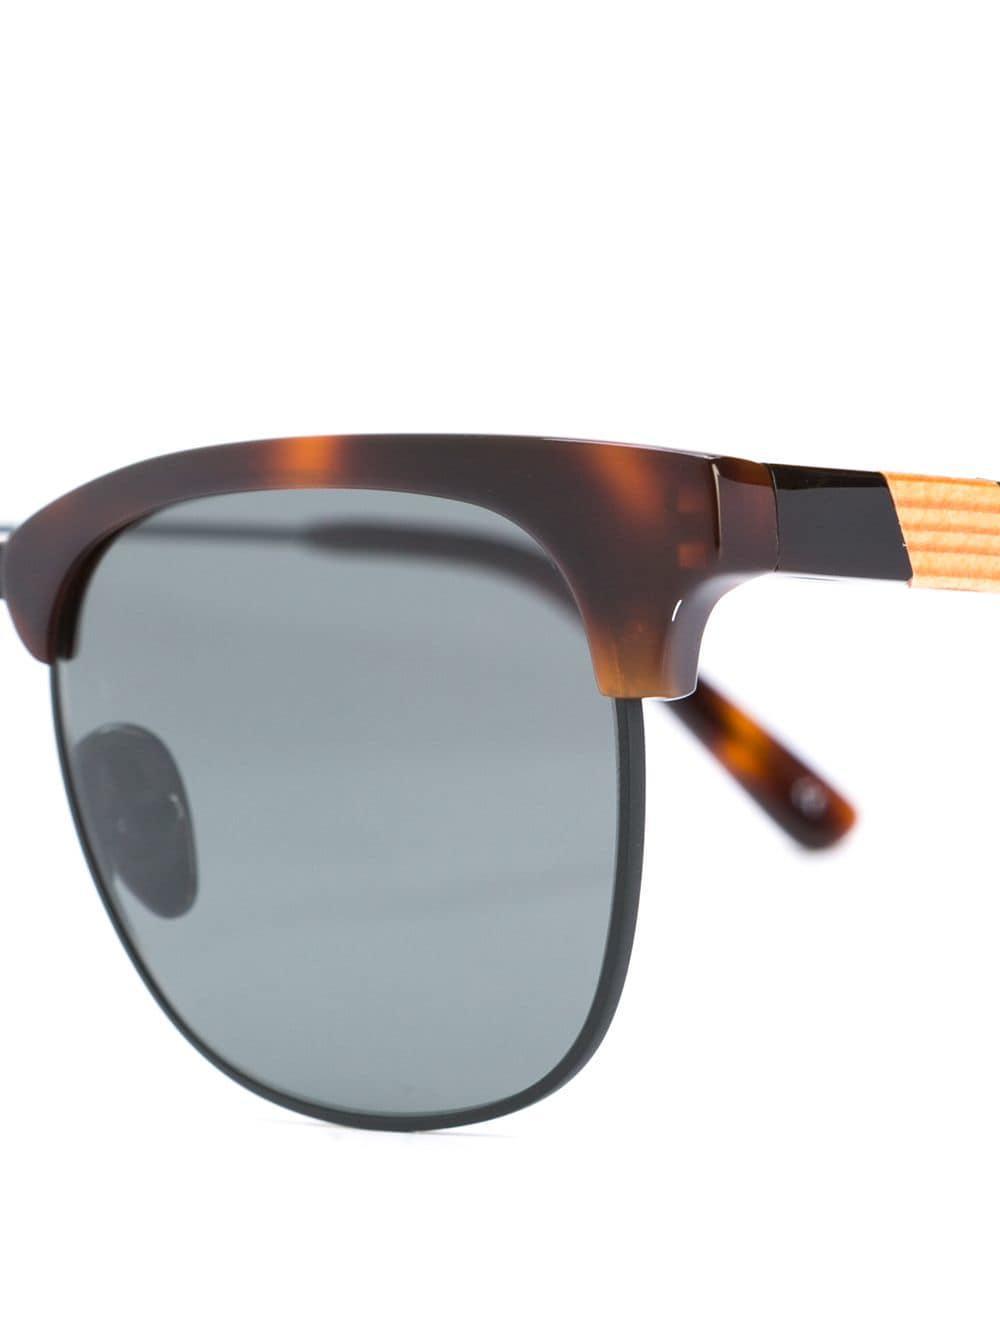 b54547e129b Lyst - Westward Leaning Vanguard 25 Sunglasses in Brown